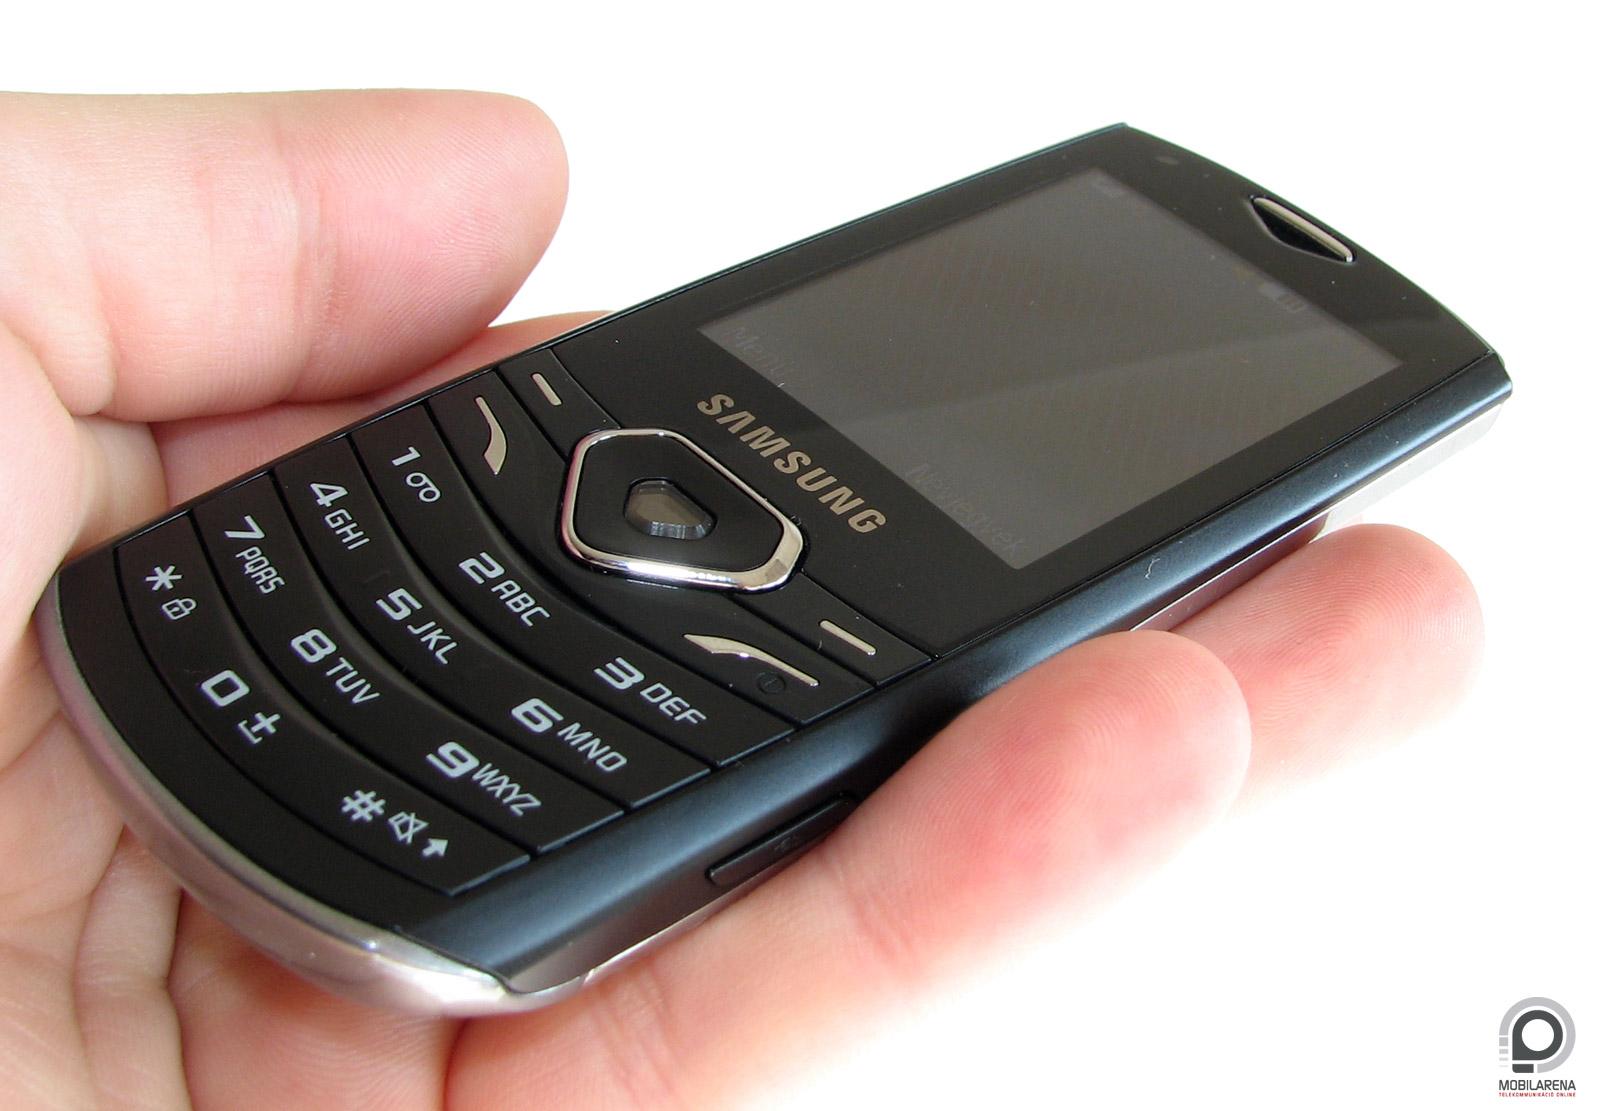 Samsung S5350 Shark   jobb  ra   rtalmatlan   Mobilarena